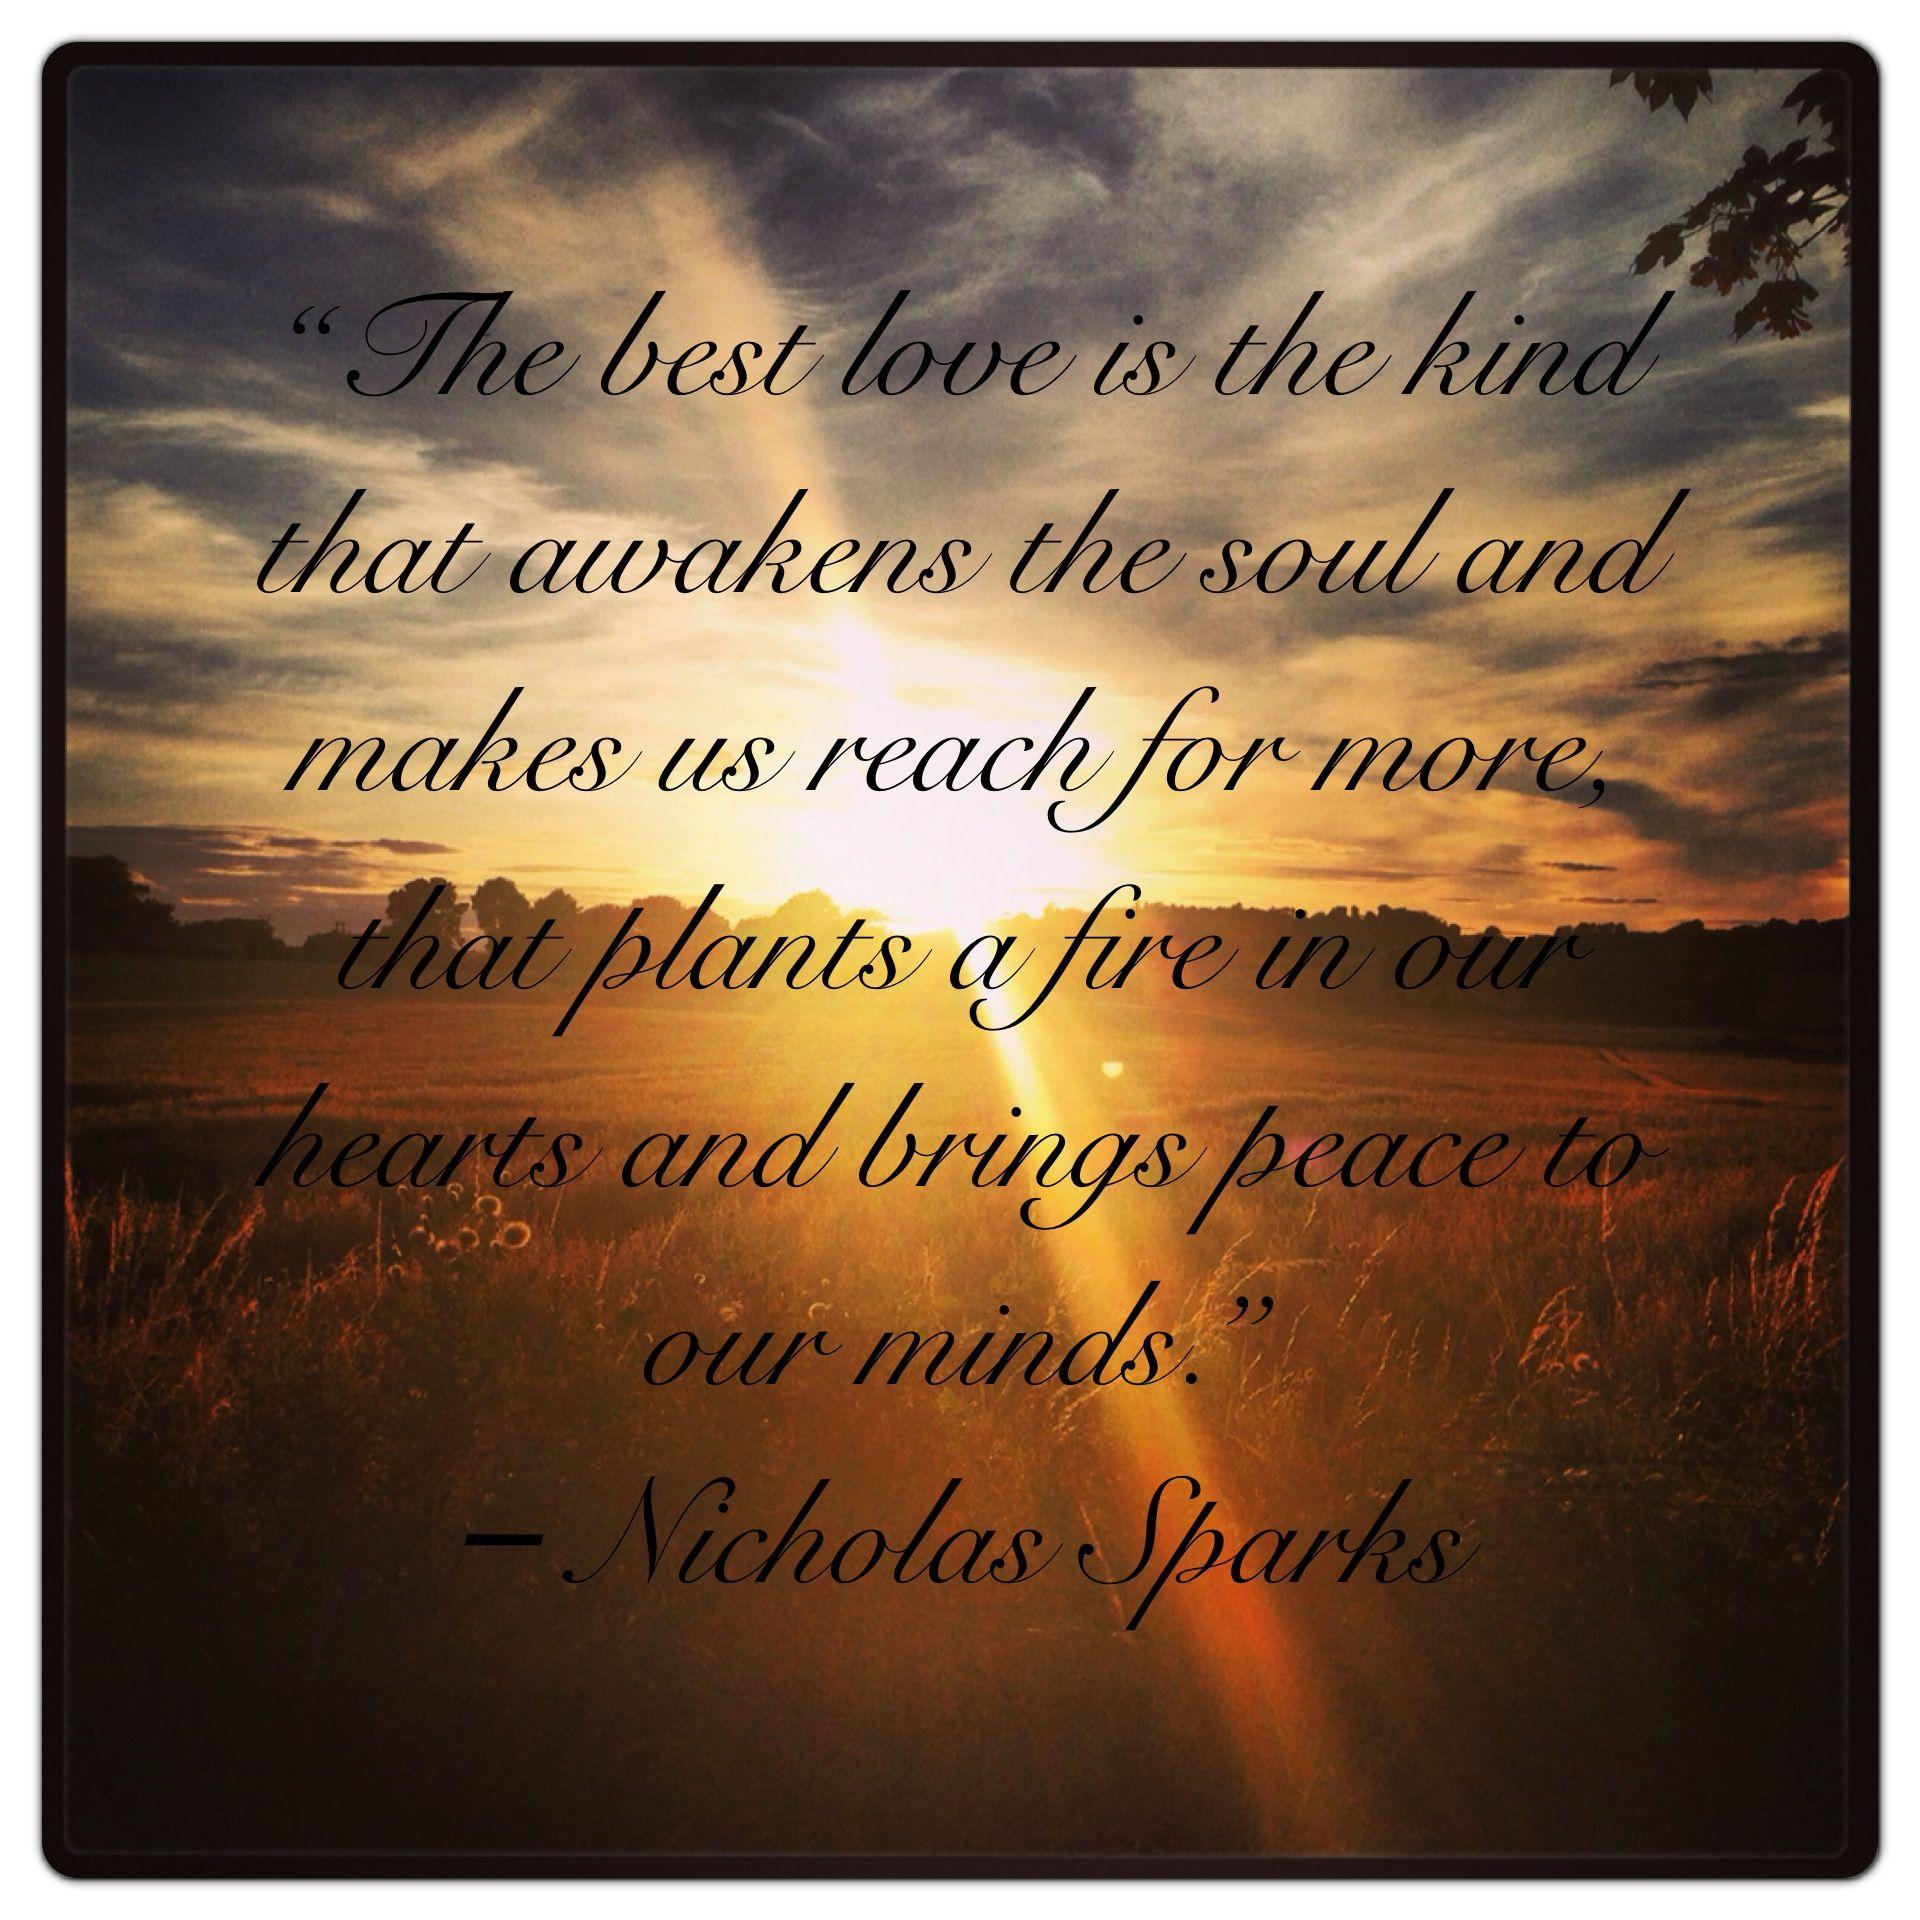 Nicholas Sparks Quotes: Nicholas Sparks Quote. Amazing!